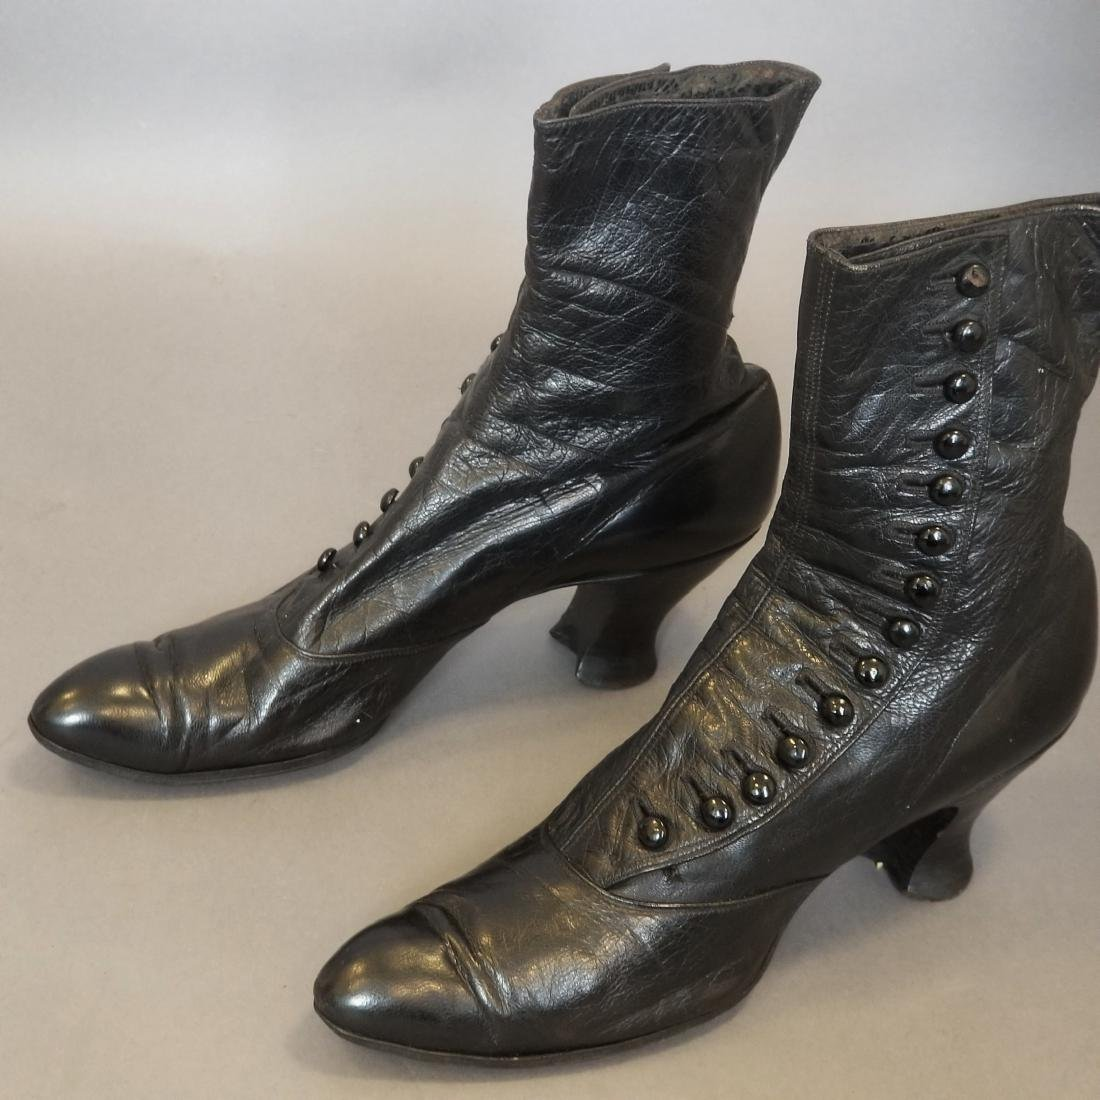 Black High Button Shoes - 4